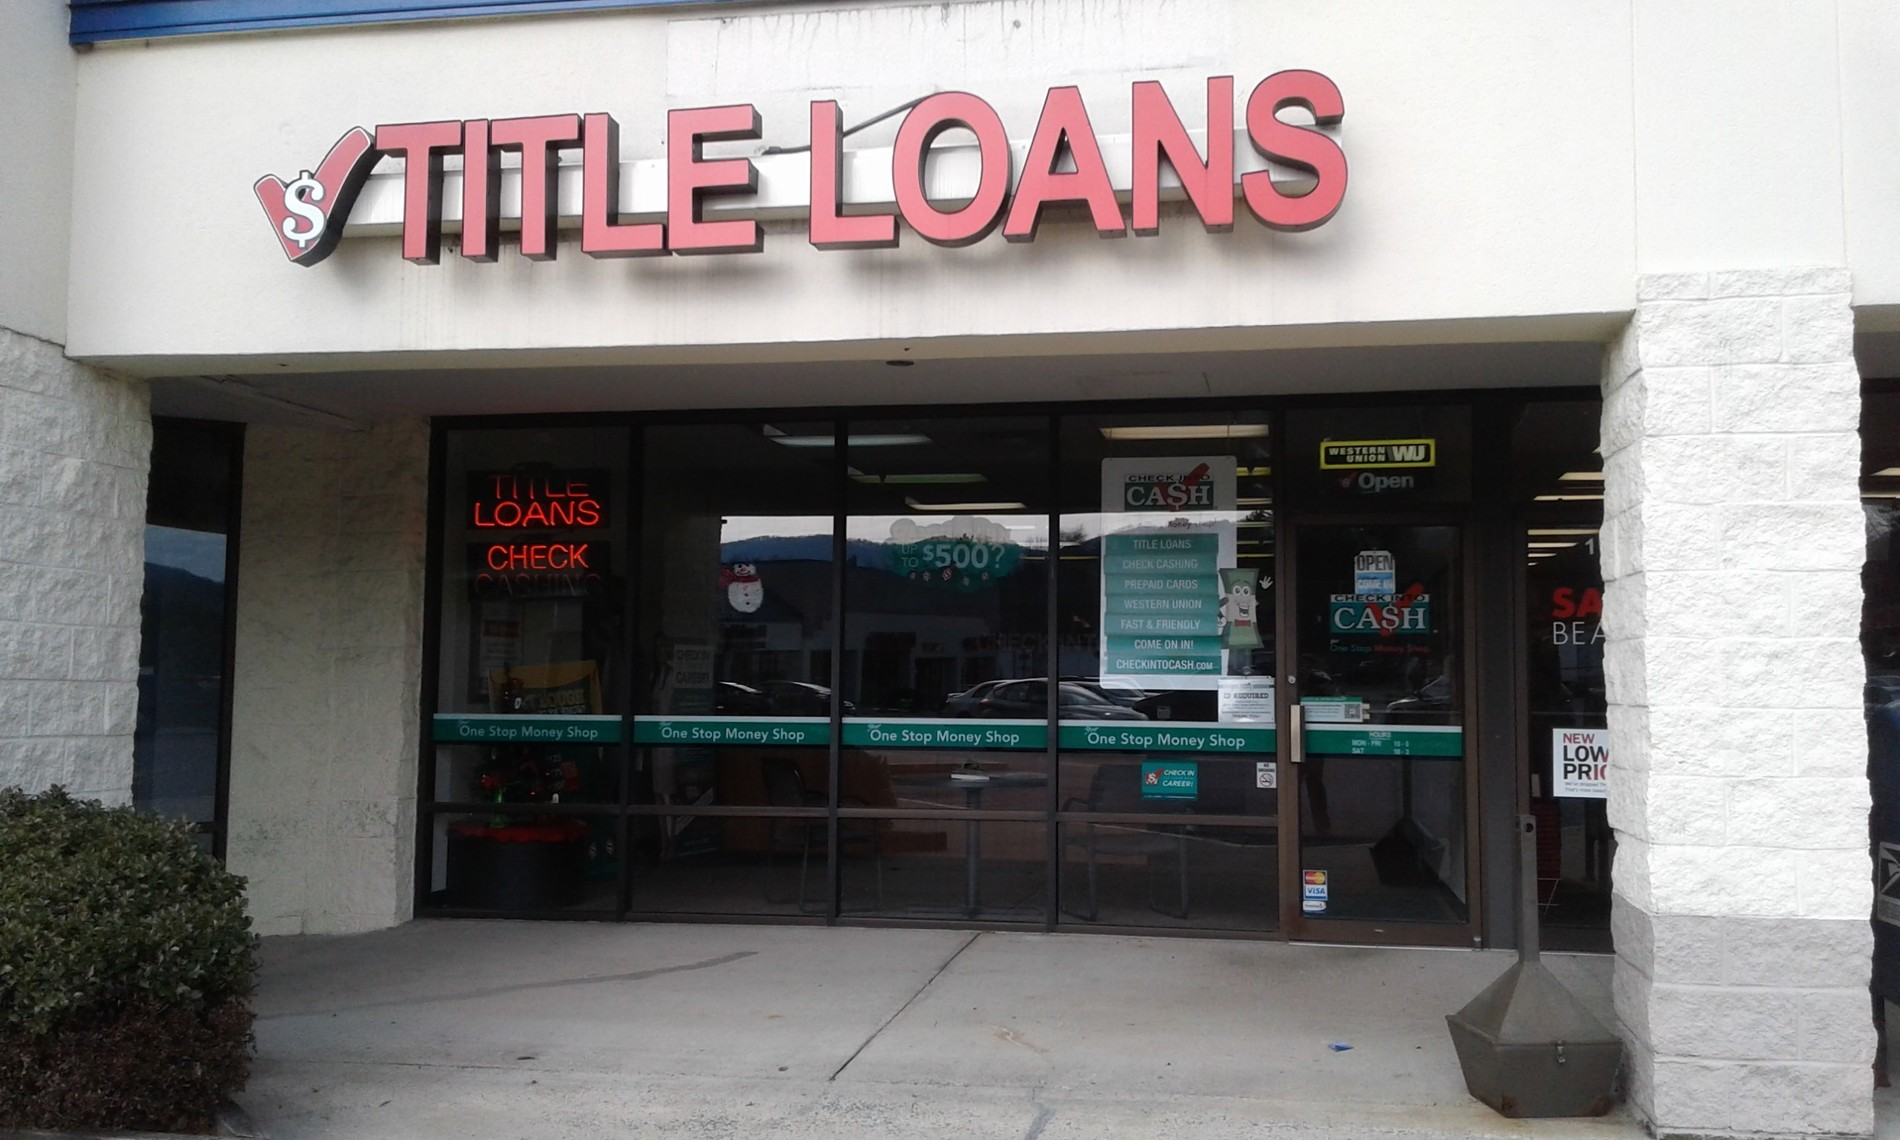 Kredyt payday loans photo 4